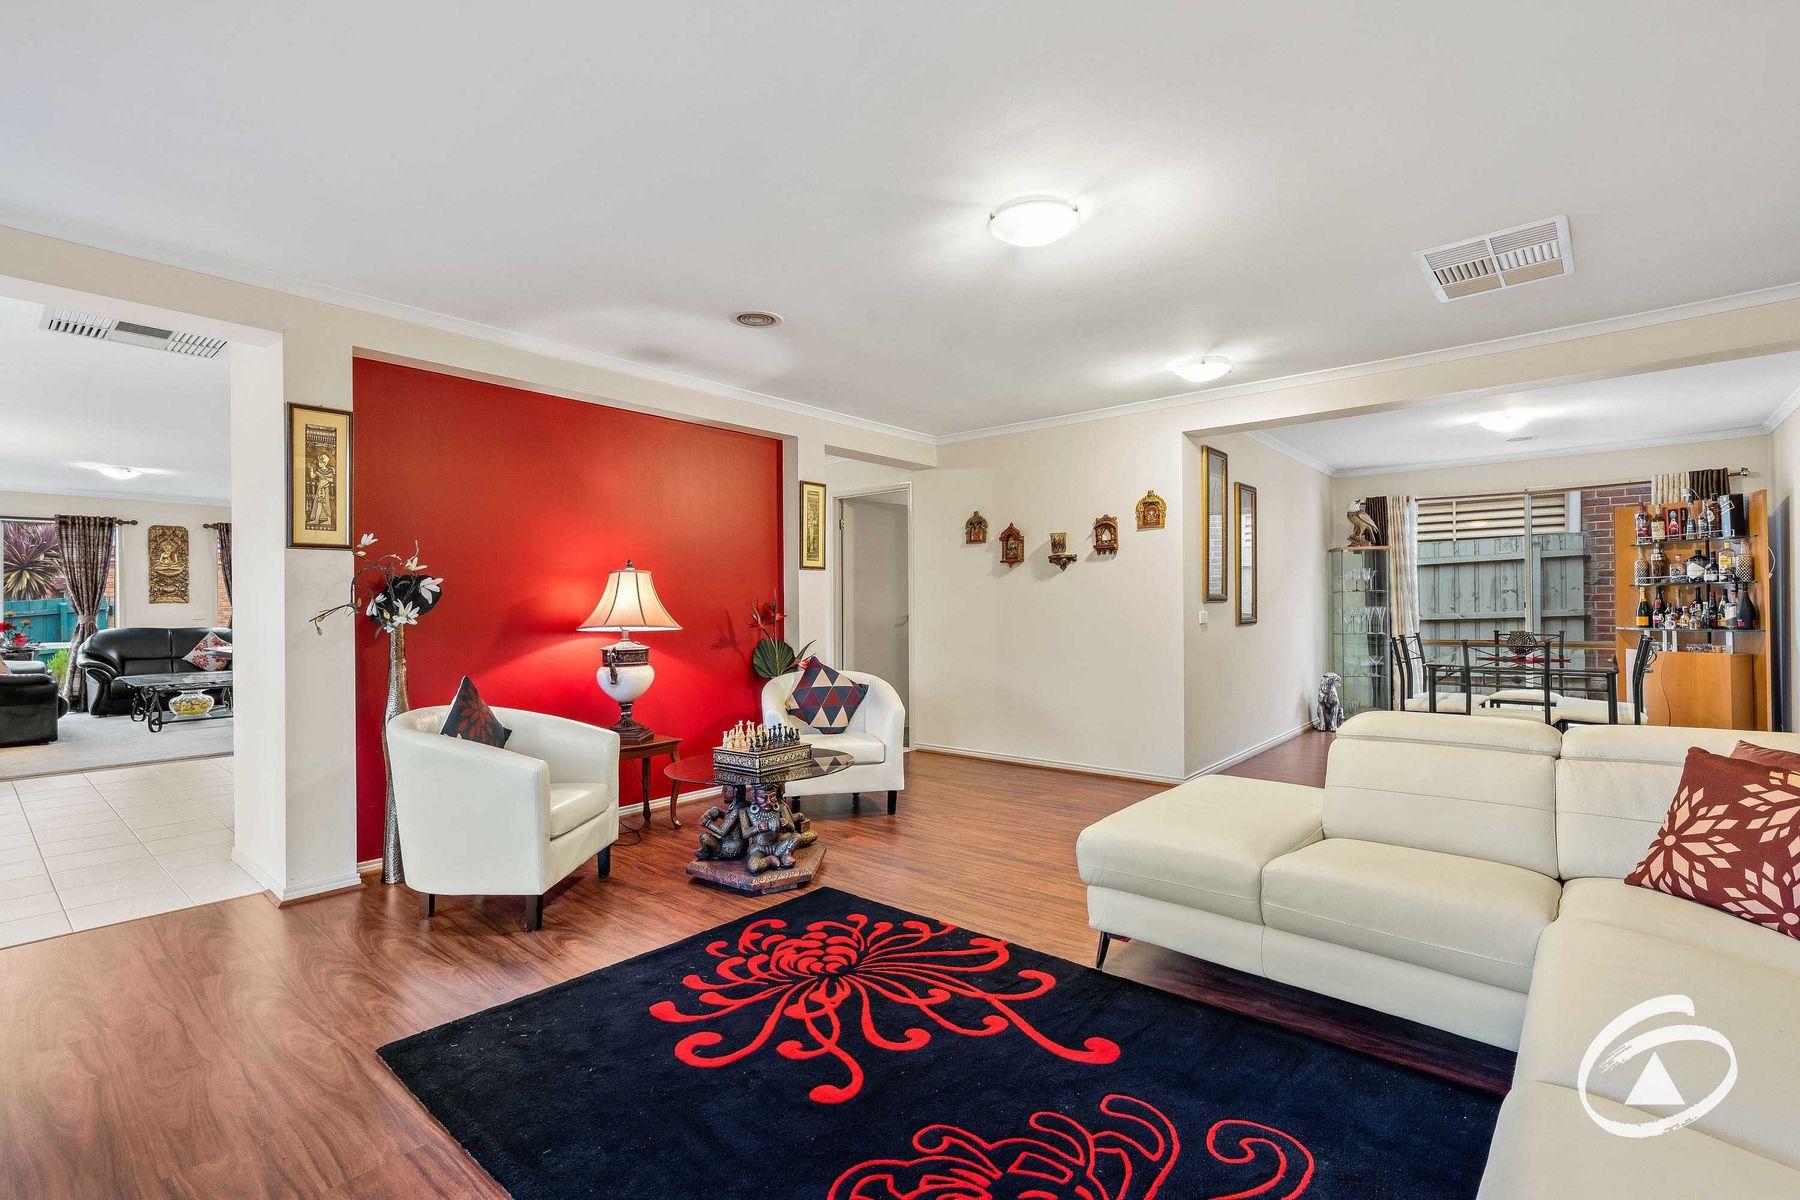 42 Home Street, Bayswater North, VIC 3153